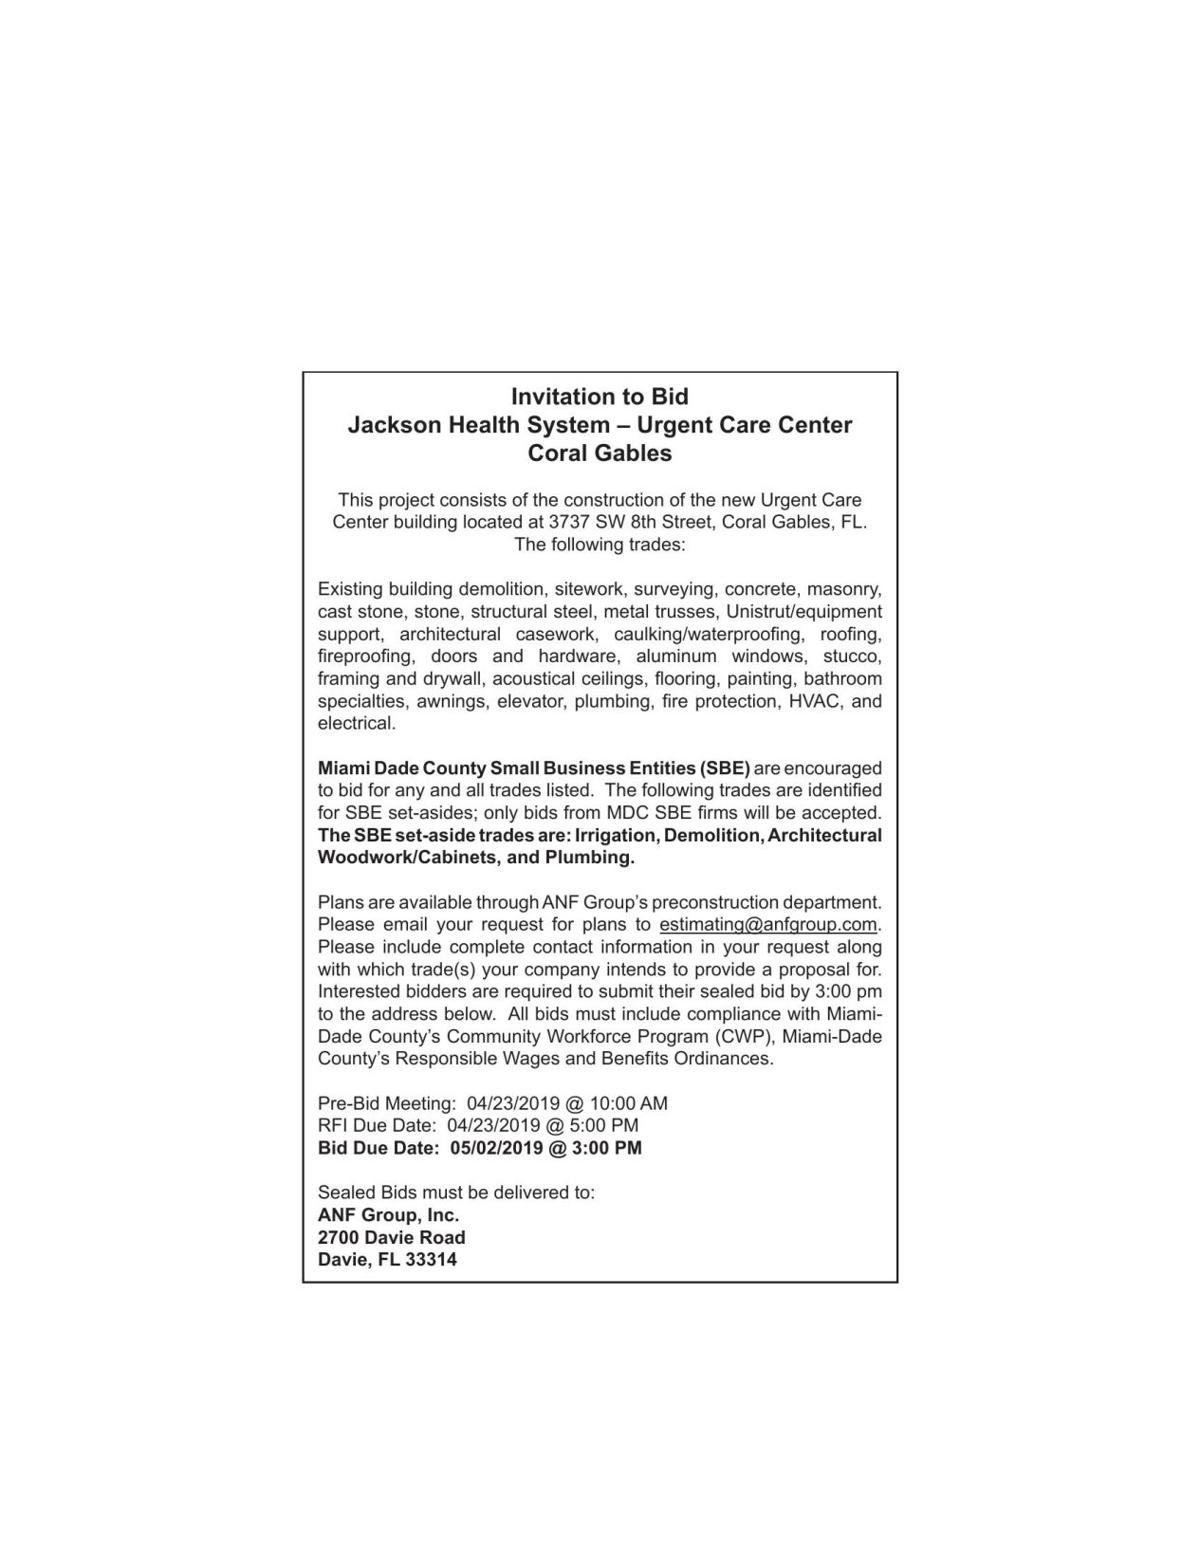 Invitation to Bid Jackson Health System – Urgent Care Center